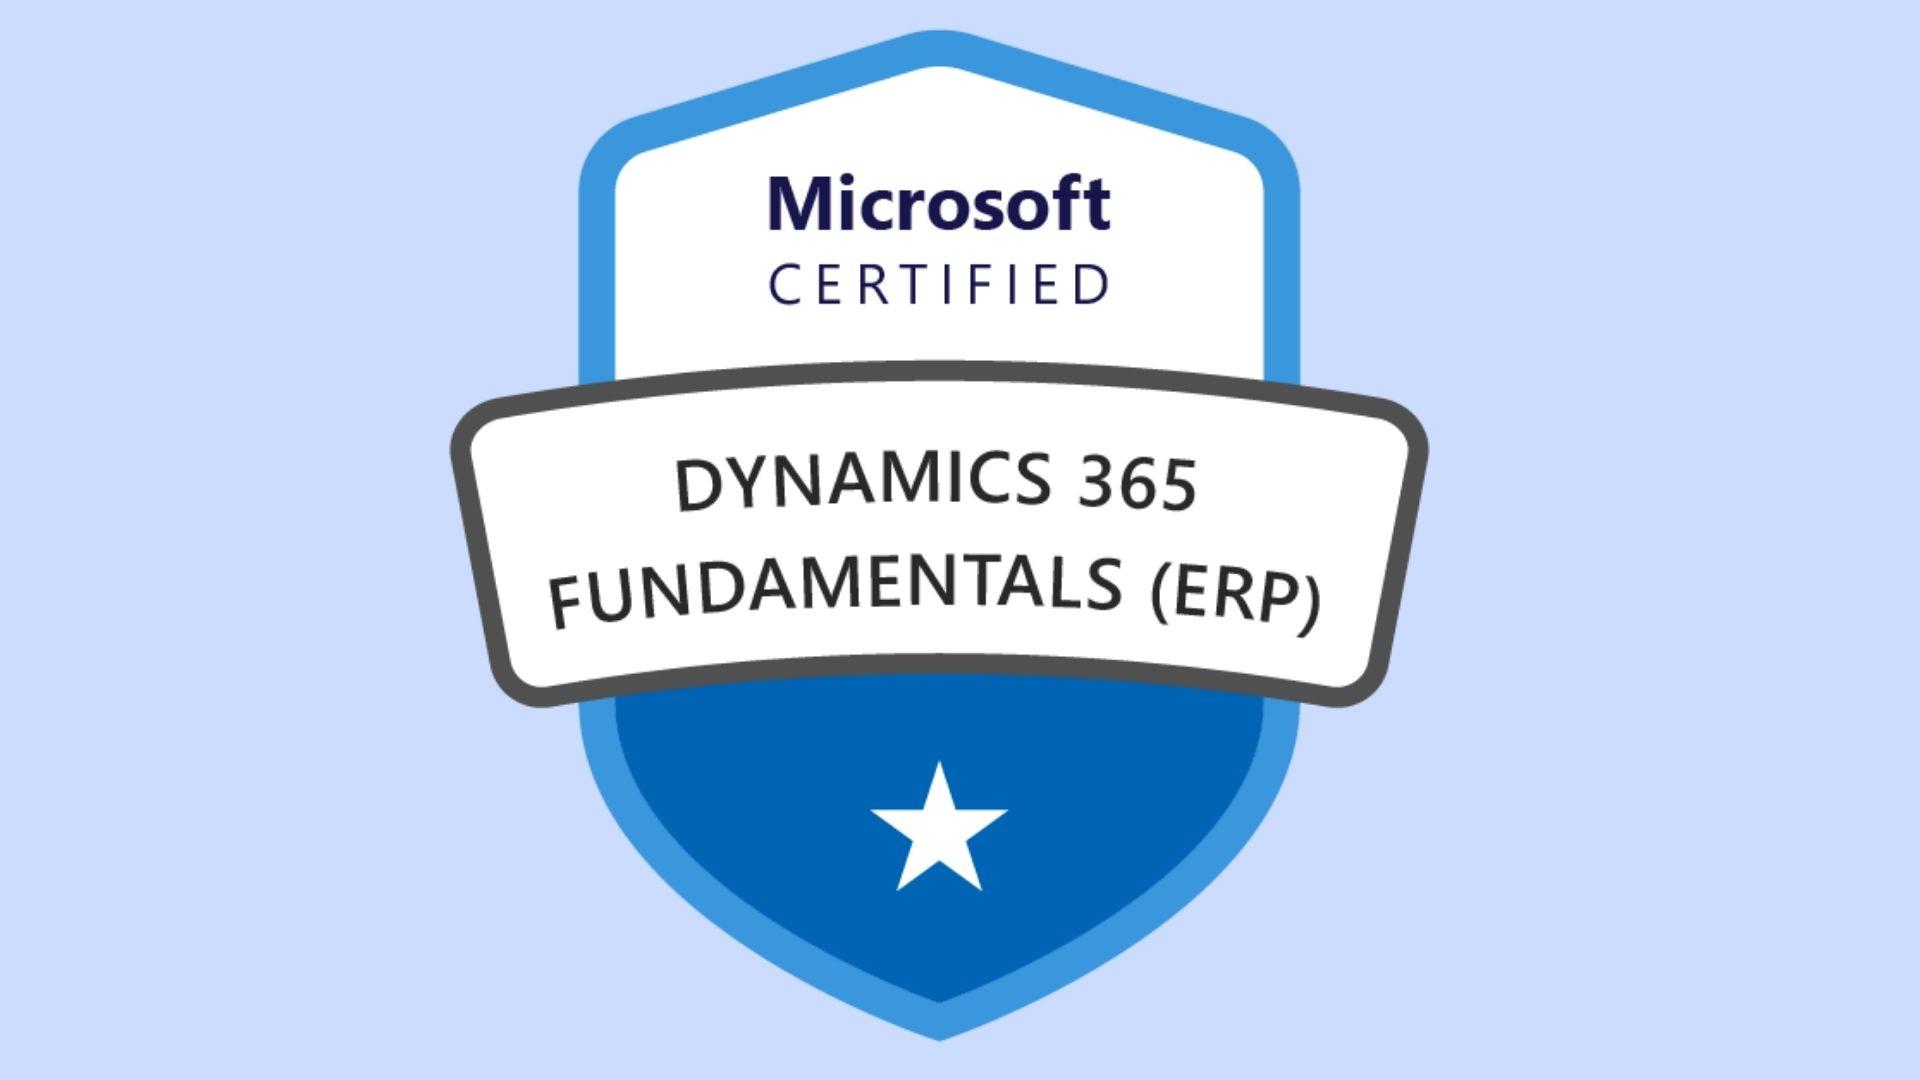 Microsoft Dynamics 365 Fundamentals ERP